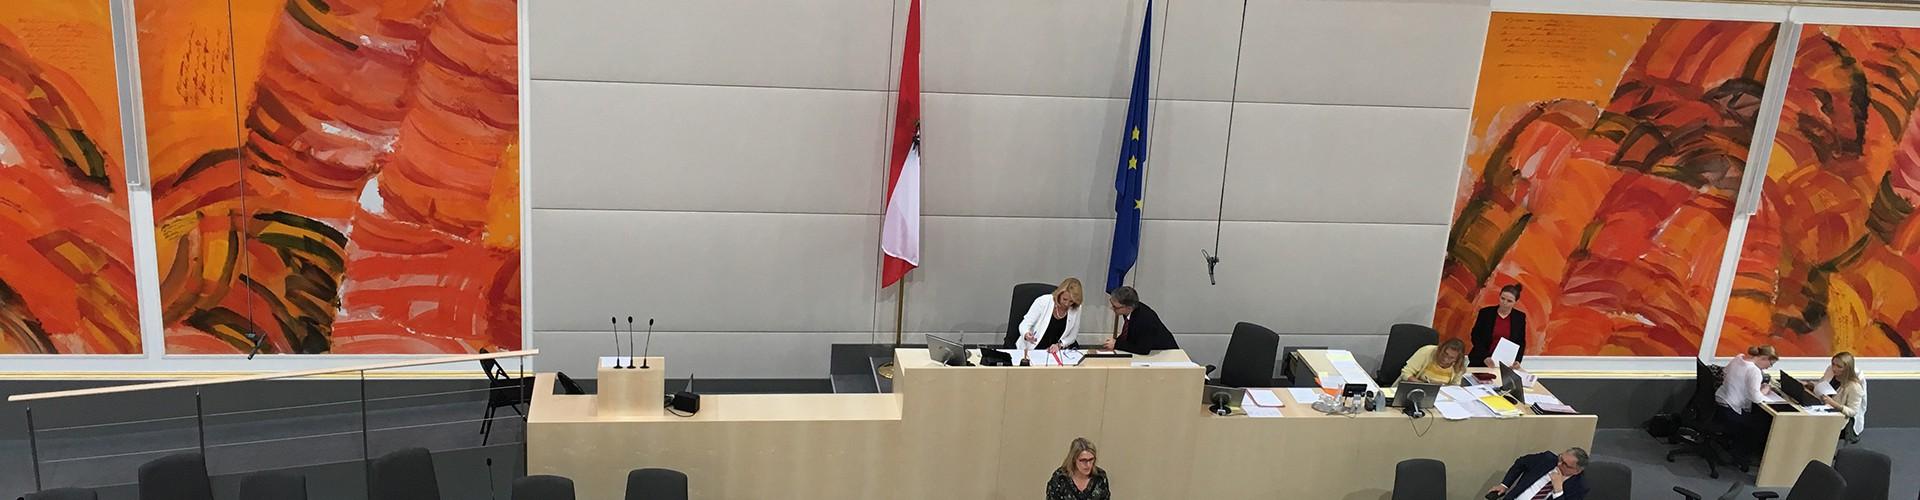 Abgeordnete Ulrike Königsberger-Ludwig (SPÖ) hält eine Rede zum Inklusionspaket